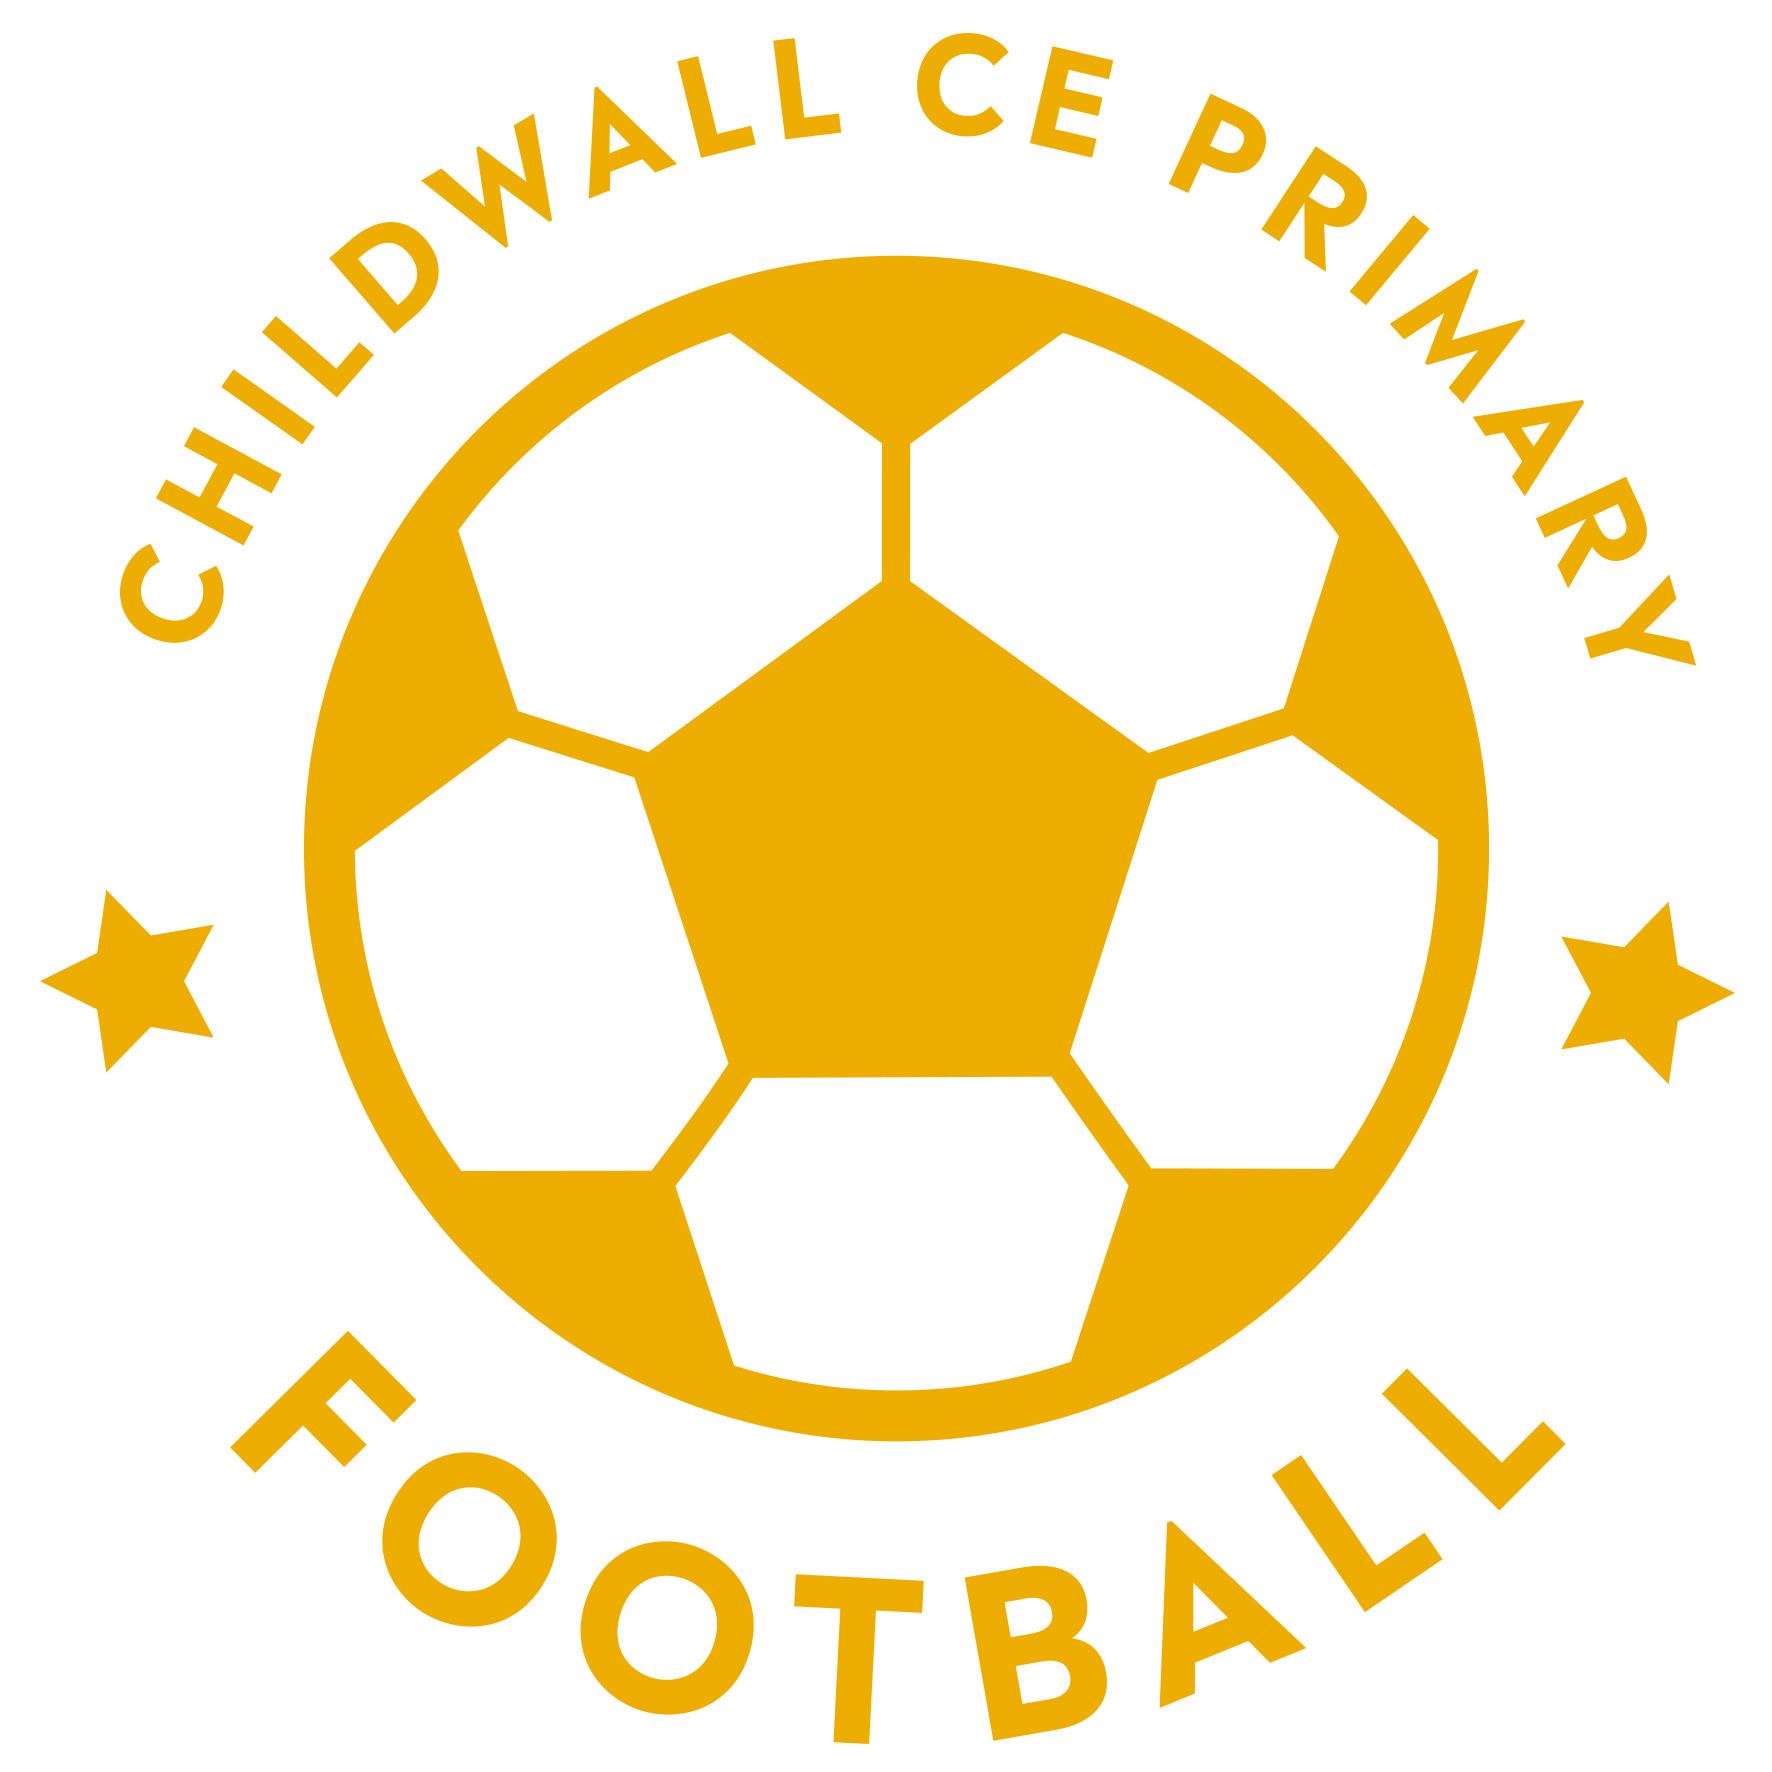 Childwall Year 5 Football